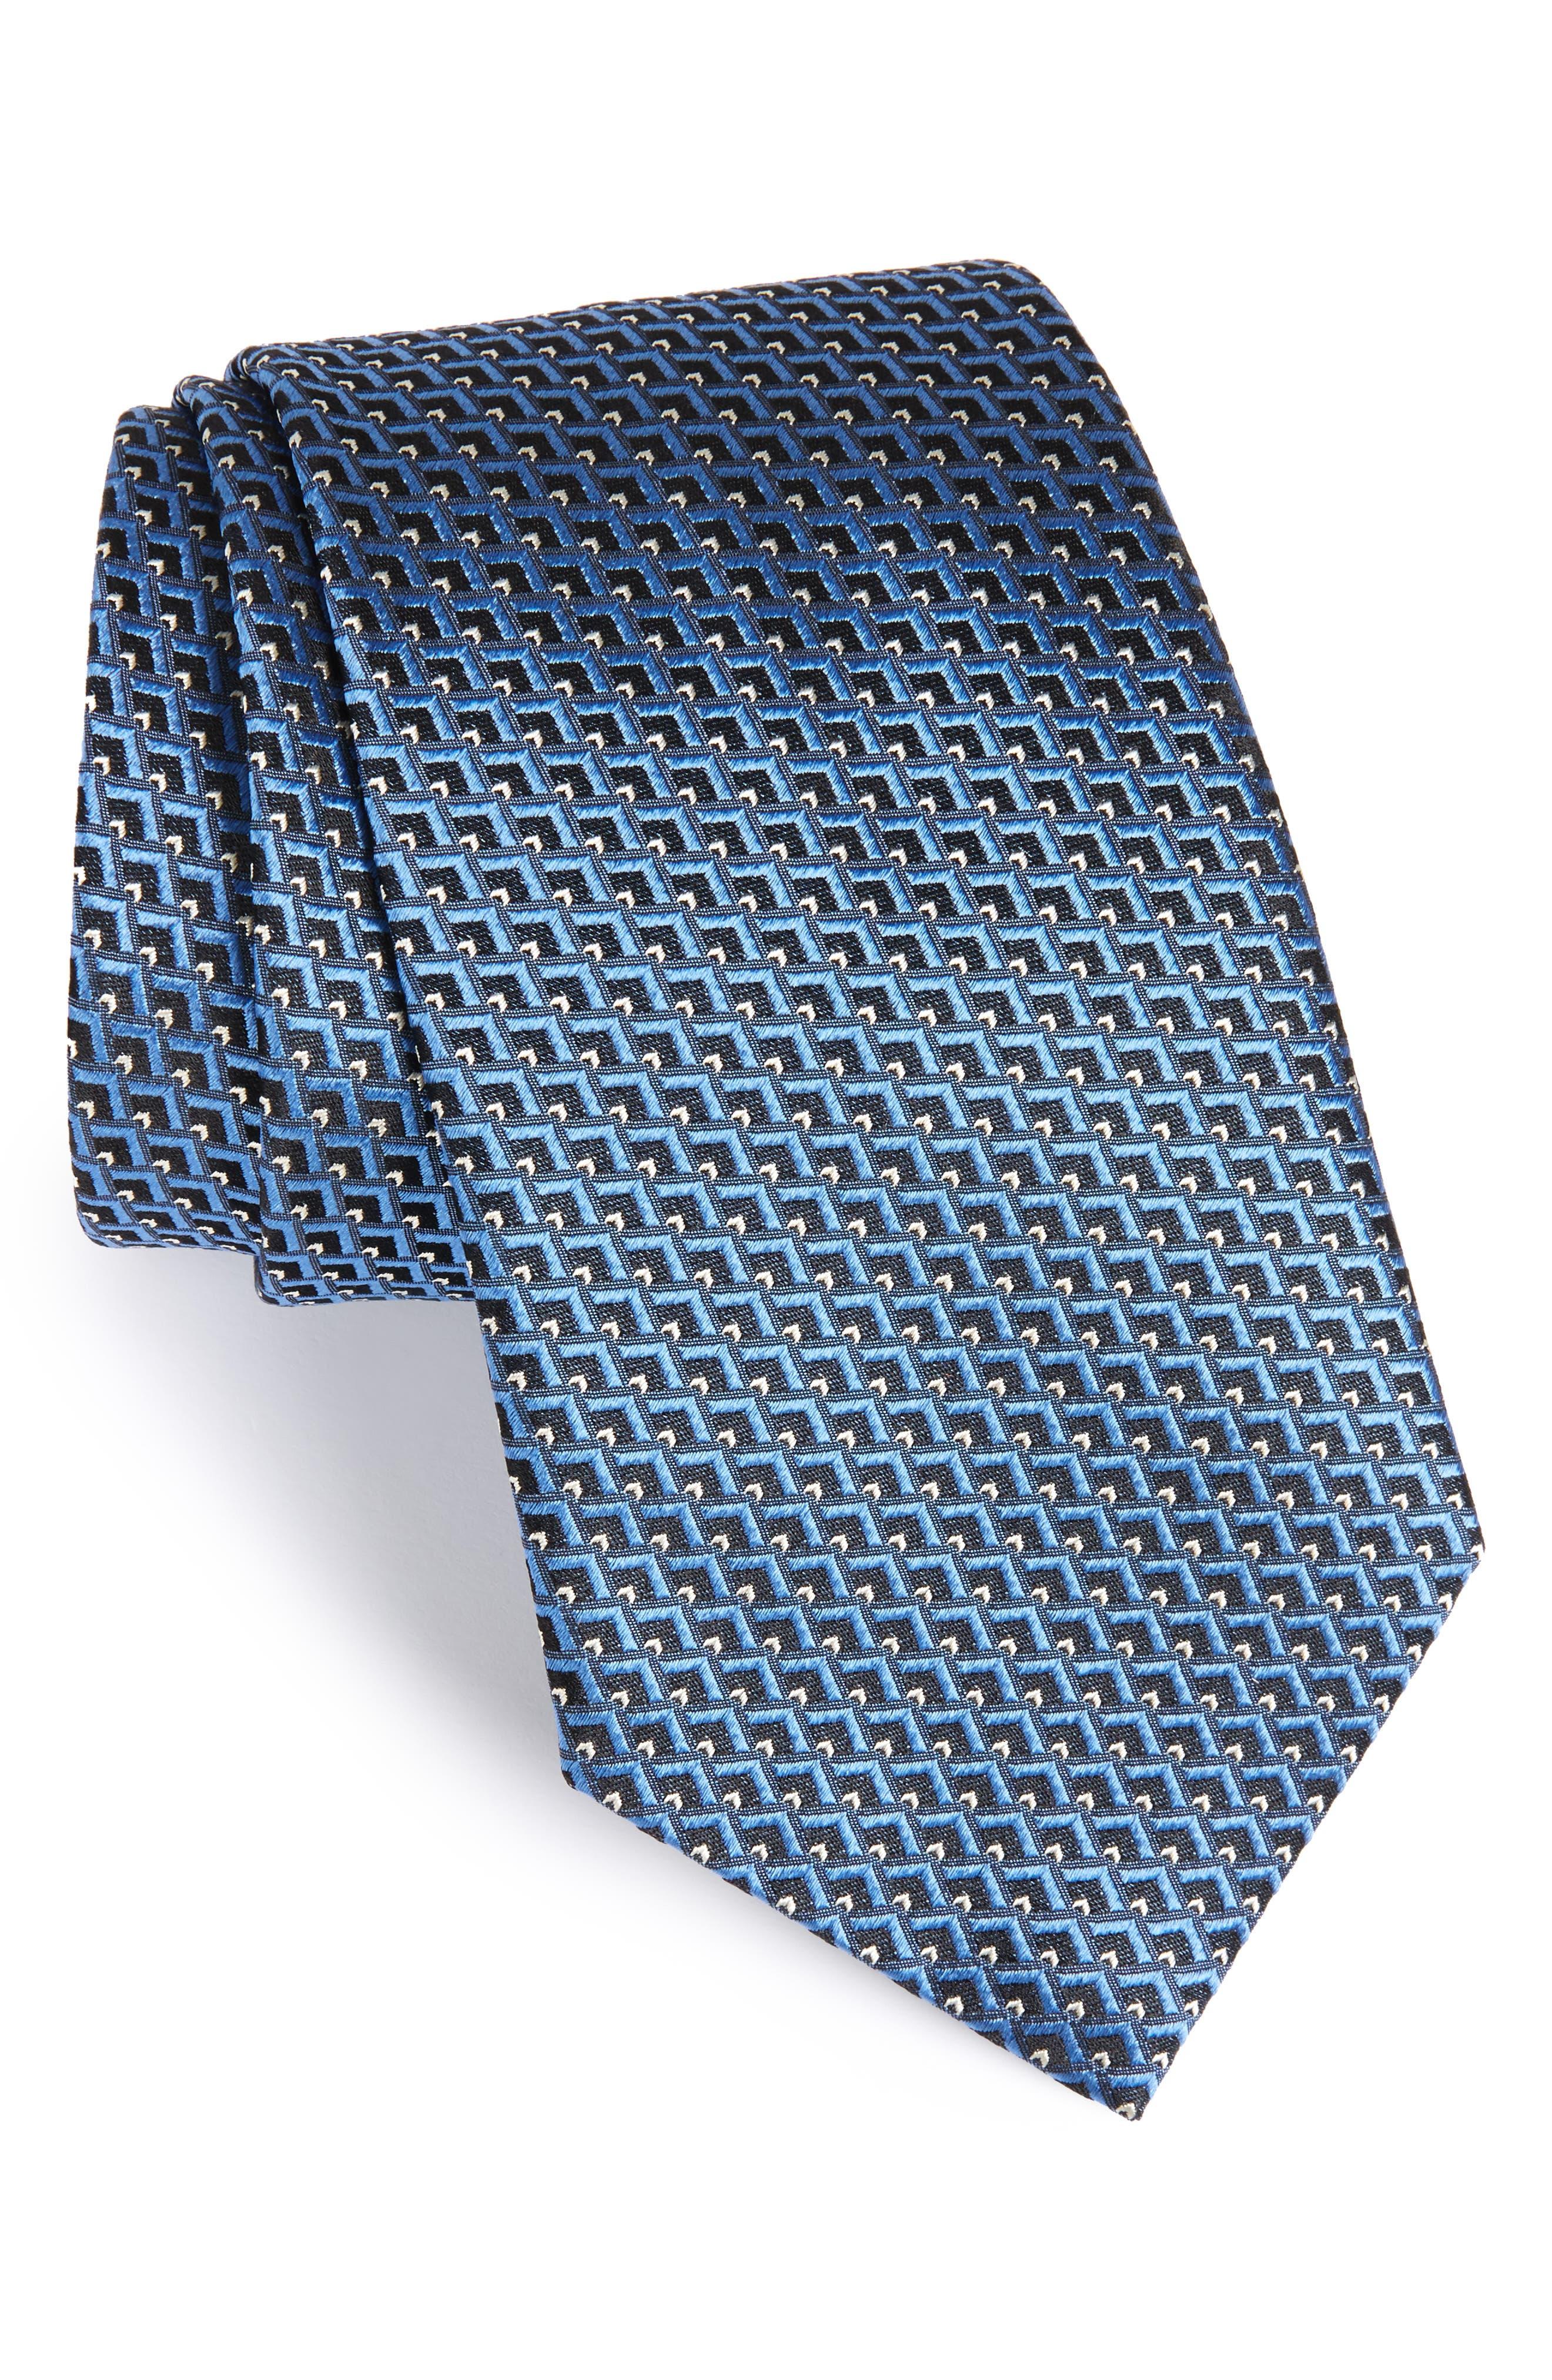 Geomeric Silk Tie,                             Main thumbnail 1, color,                             428